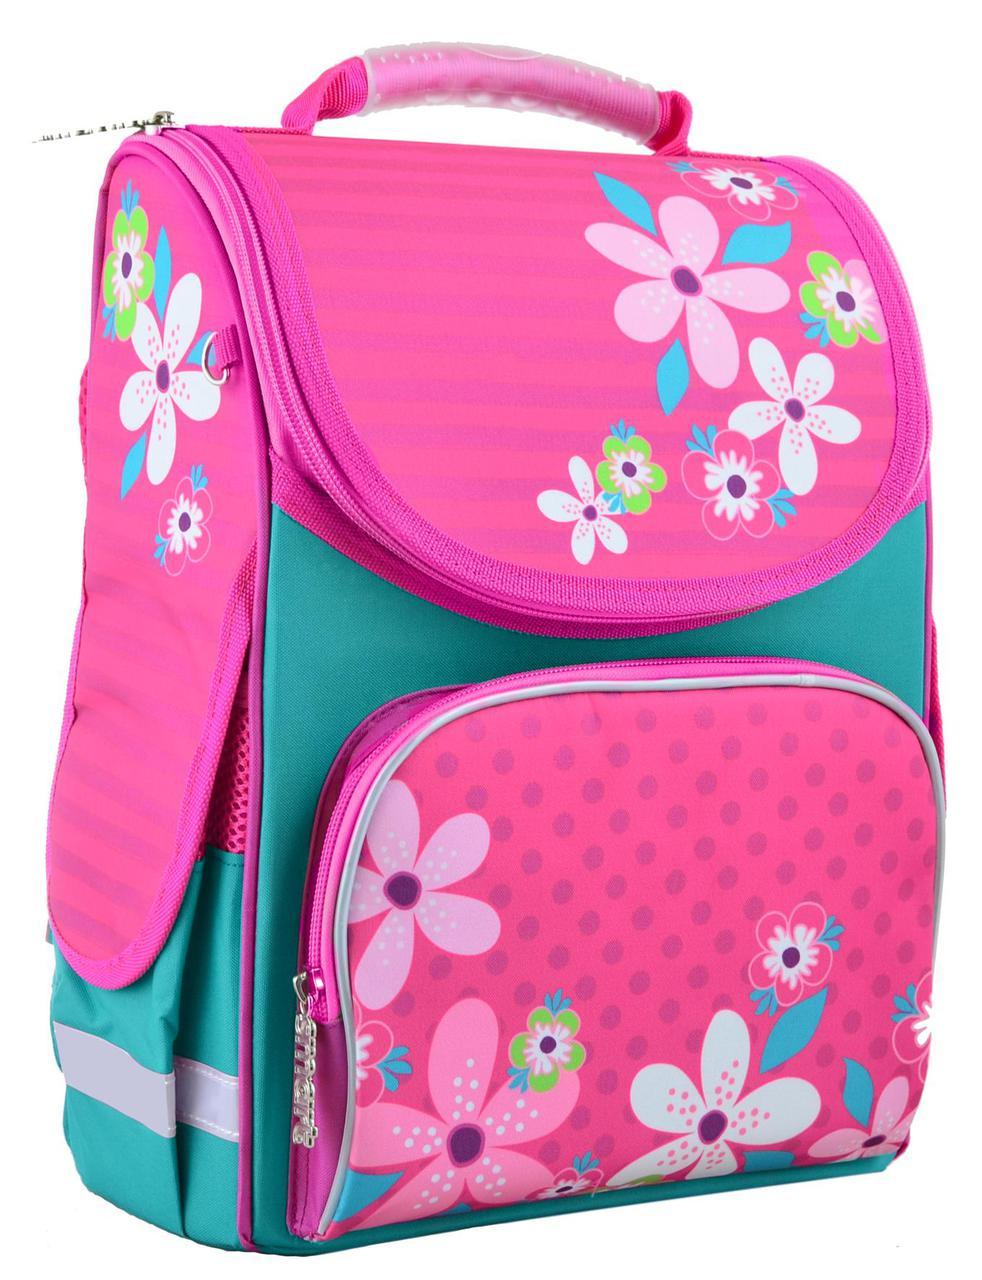 447cd7948a86 Рюкзак каркасный 1 вересня Smart PG-11 Flower pink 554445 -  Интернет-магазин Kindermir